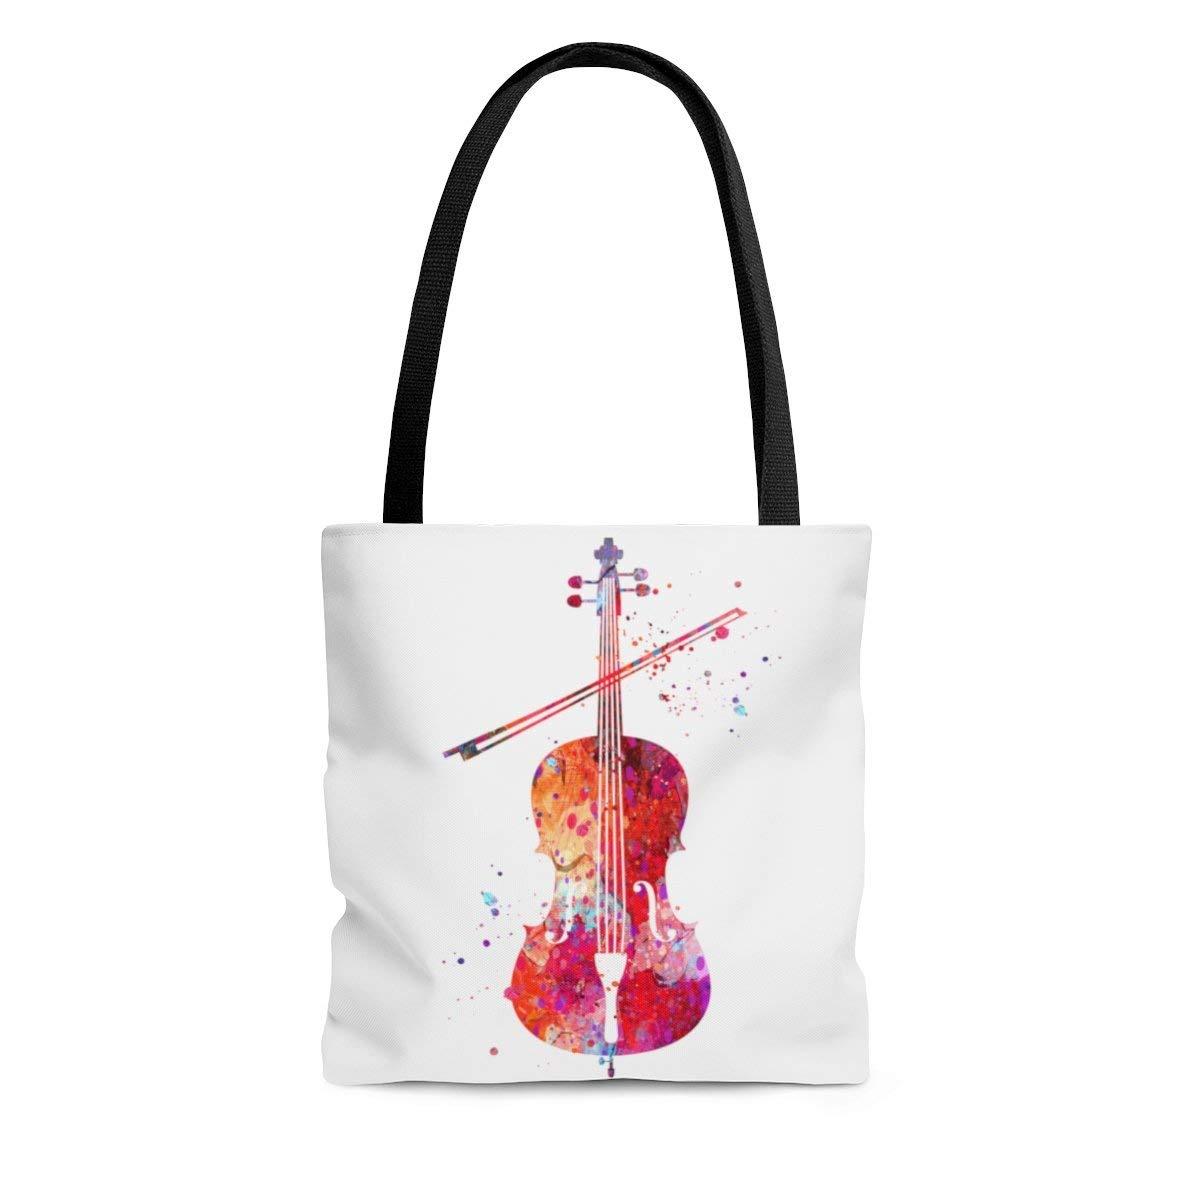 Amazon.com: Watercolor Cello Tote Bag, Books Bag, Beach Bag ...